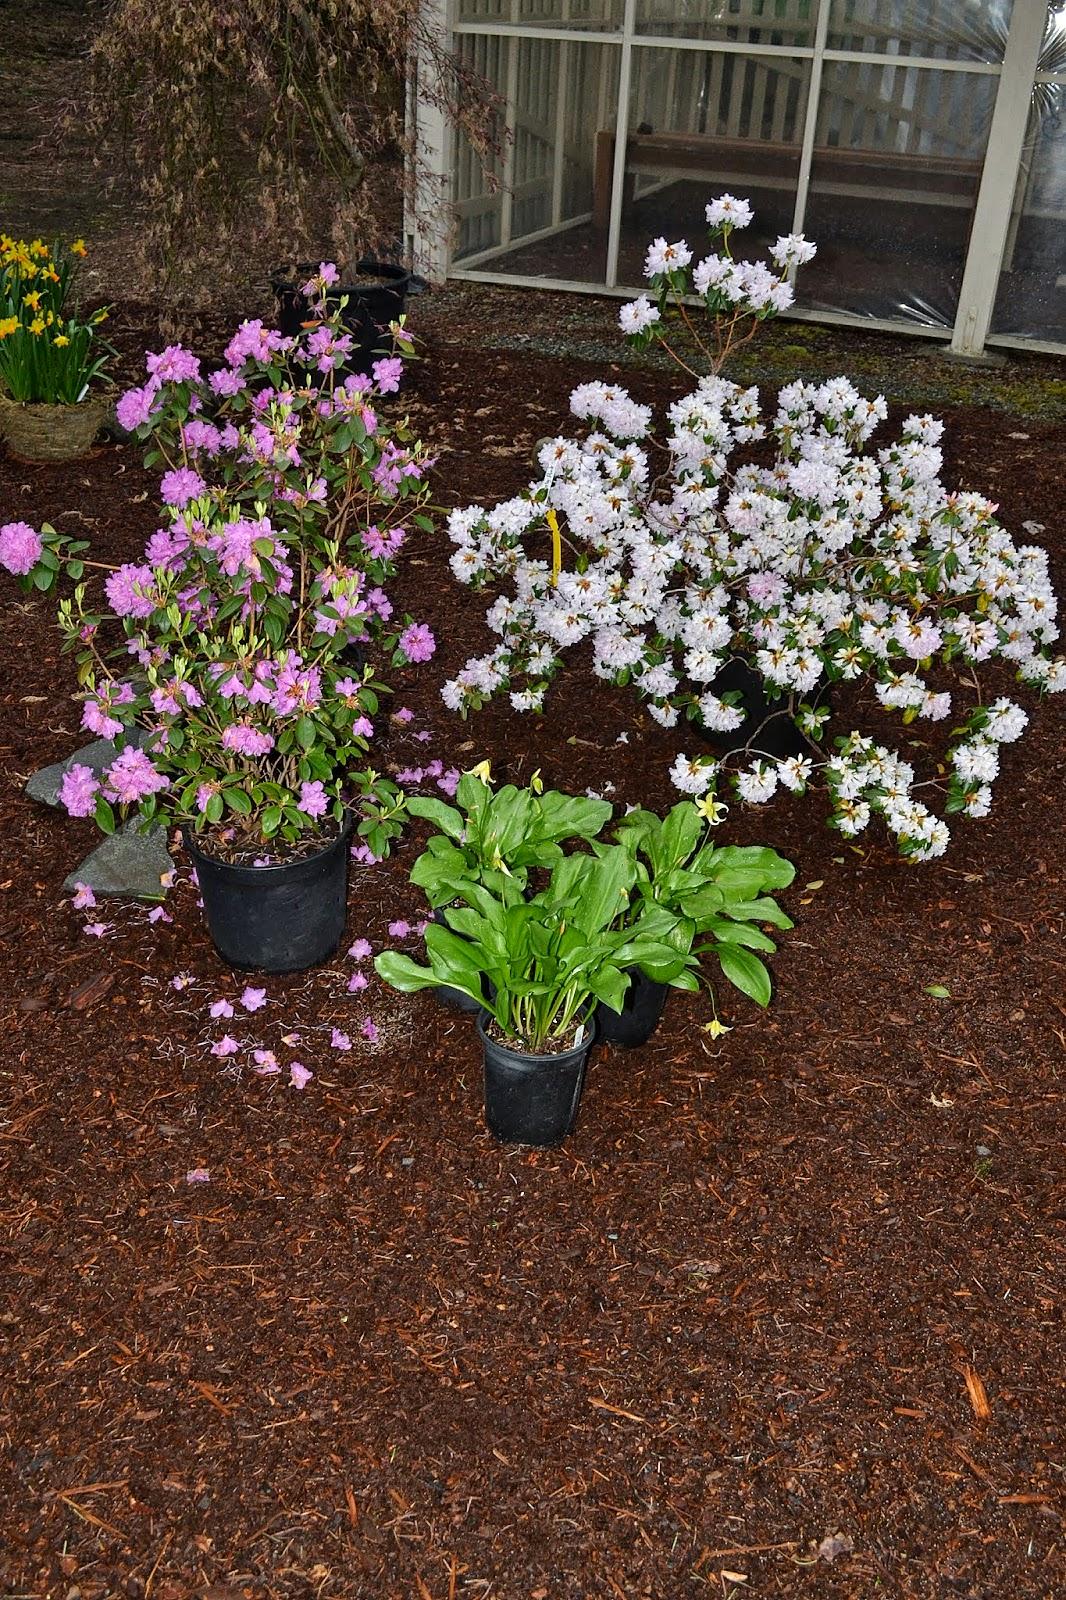 The Outlaw Gardener: Springing Over to the Rhododendron Garden Nursery